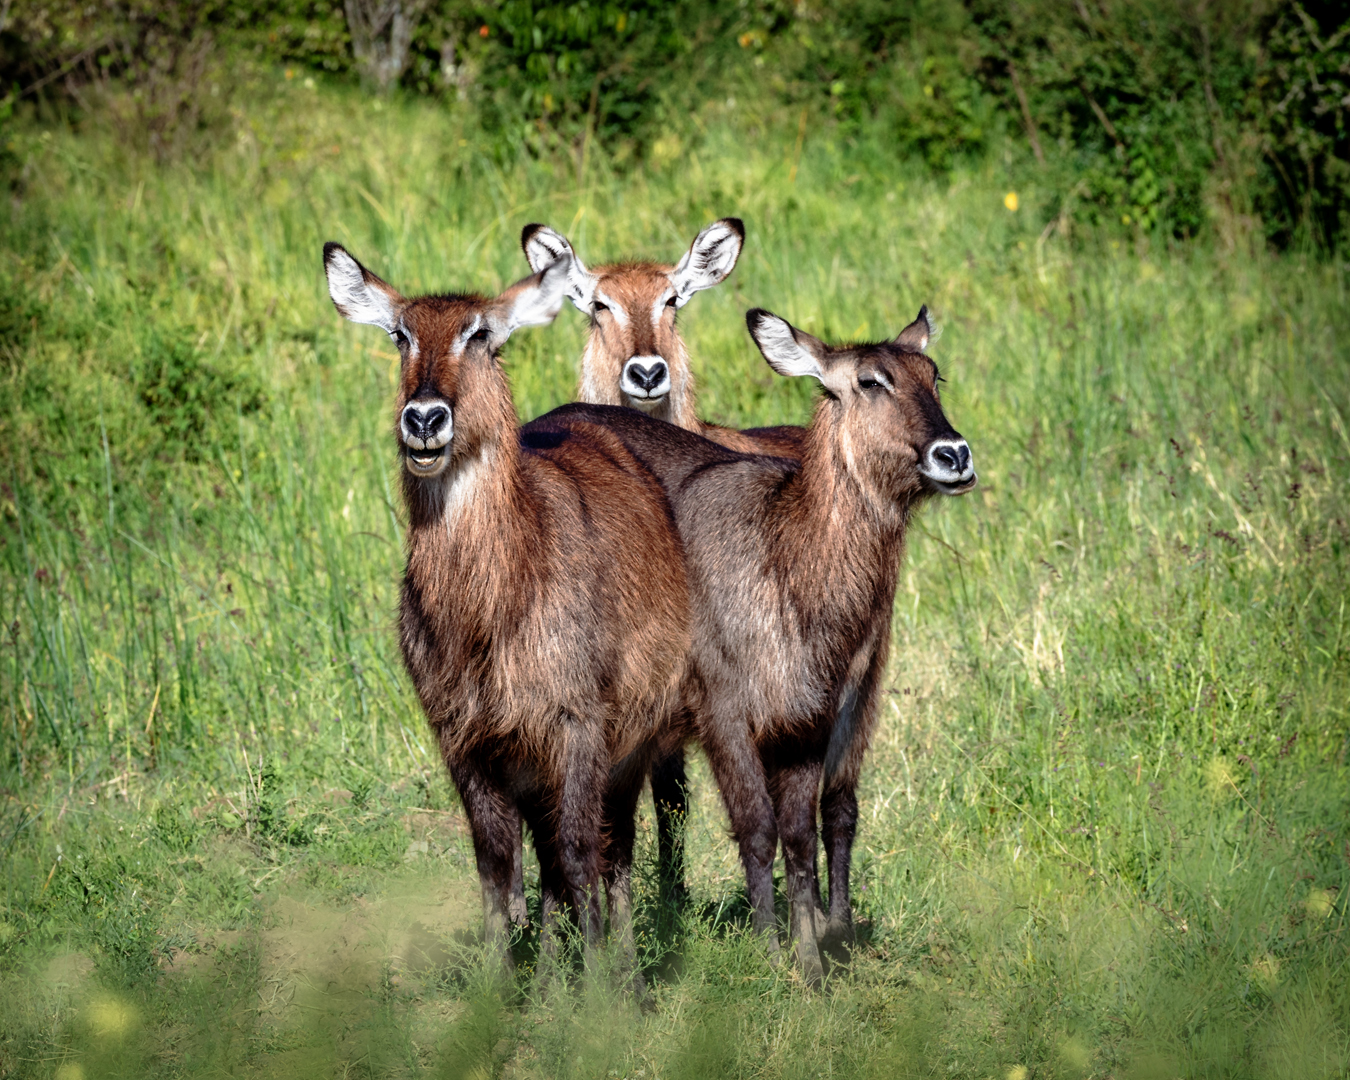 Three Cute Waterbuck Together in Kenya.jpg